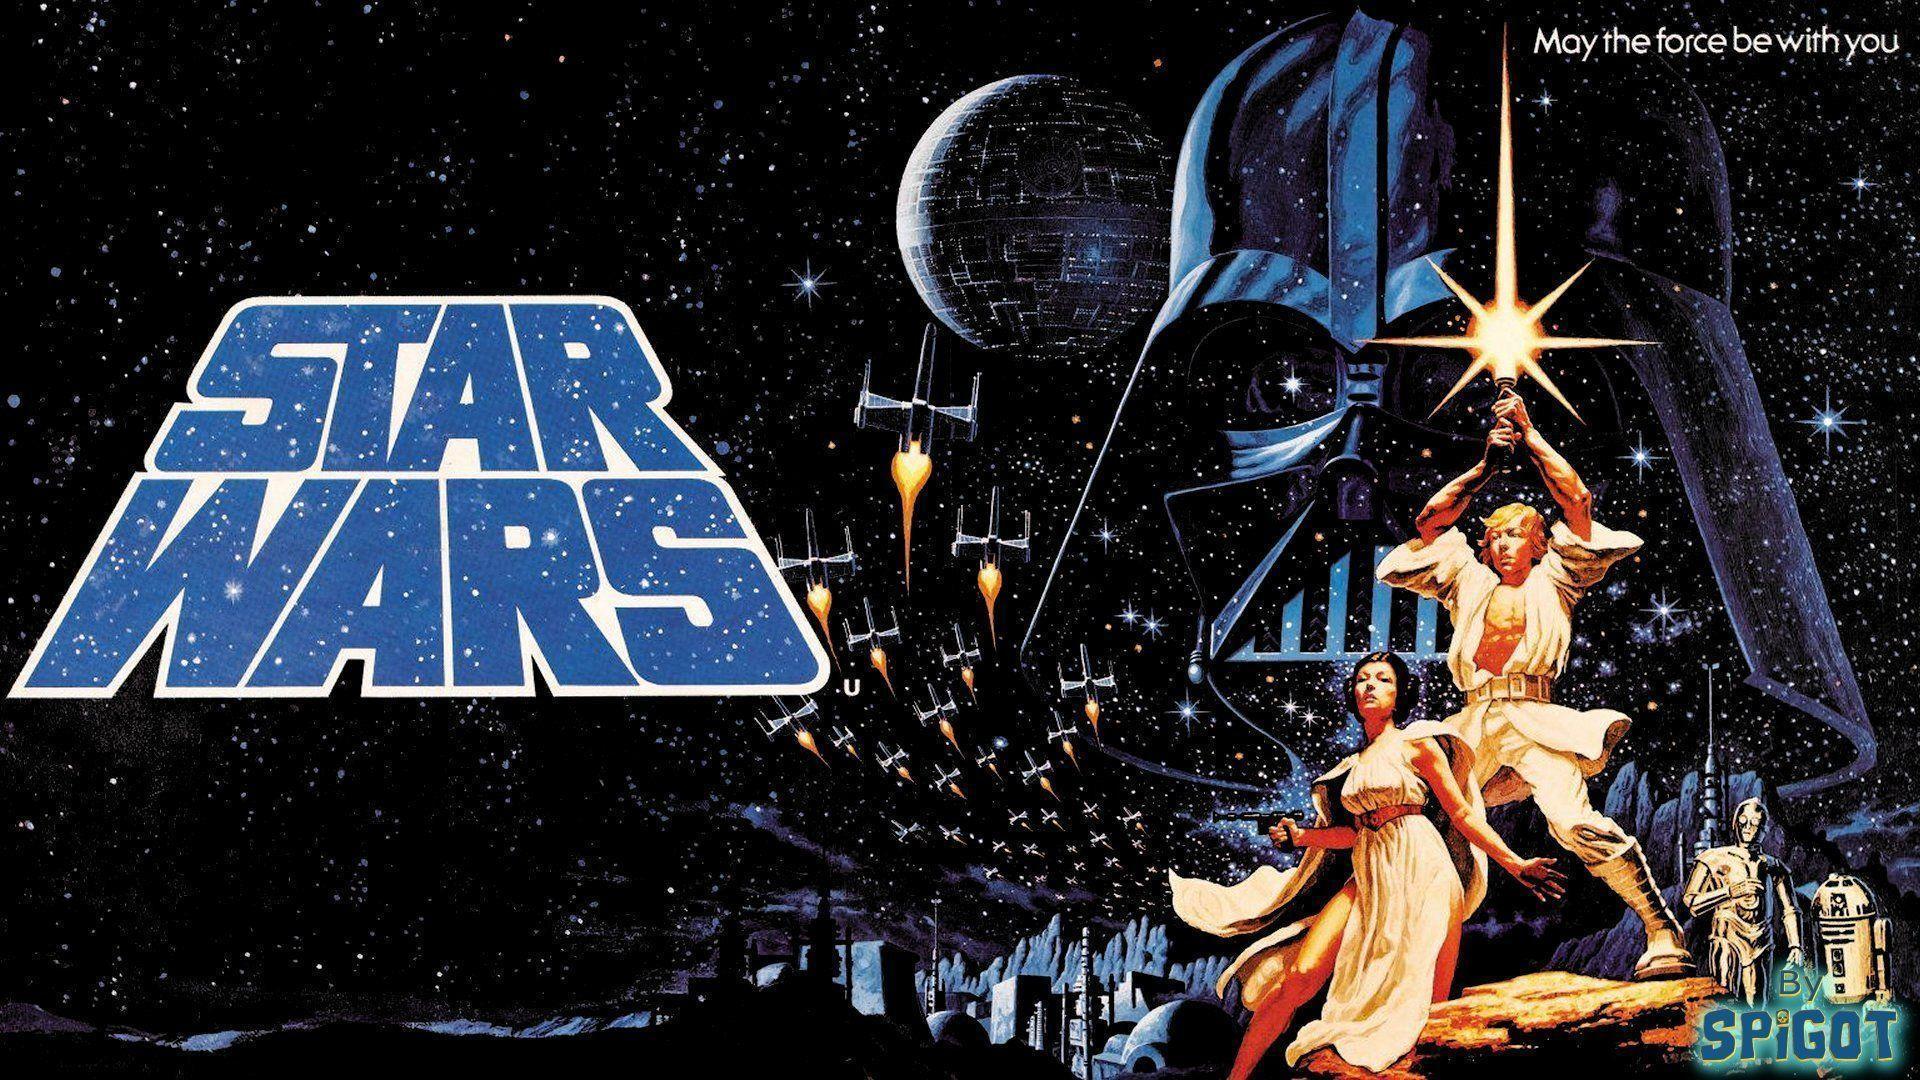 Download Star Wars Desktop Wallpaper Hd Backgrounds Download Itl Cat